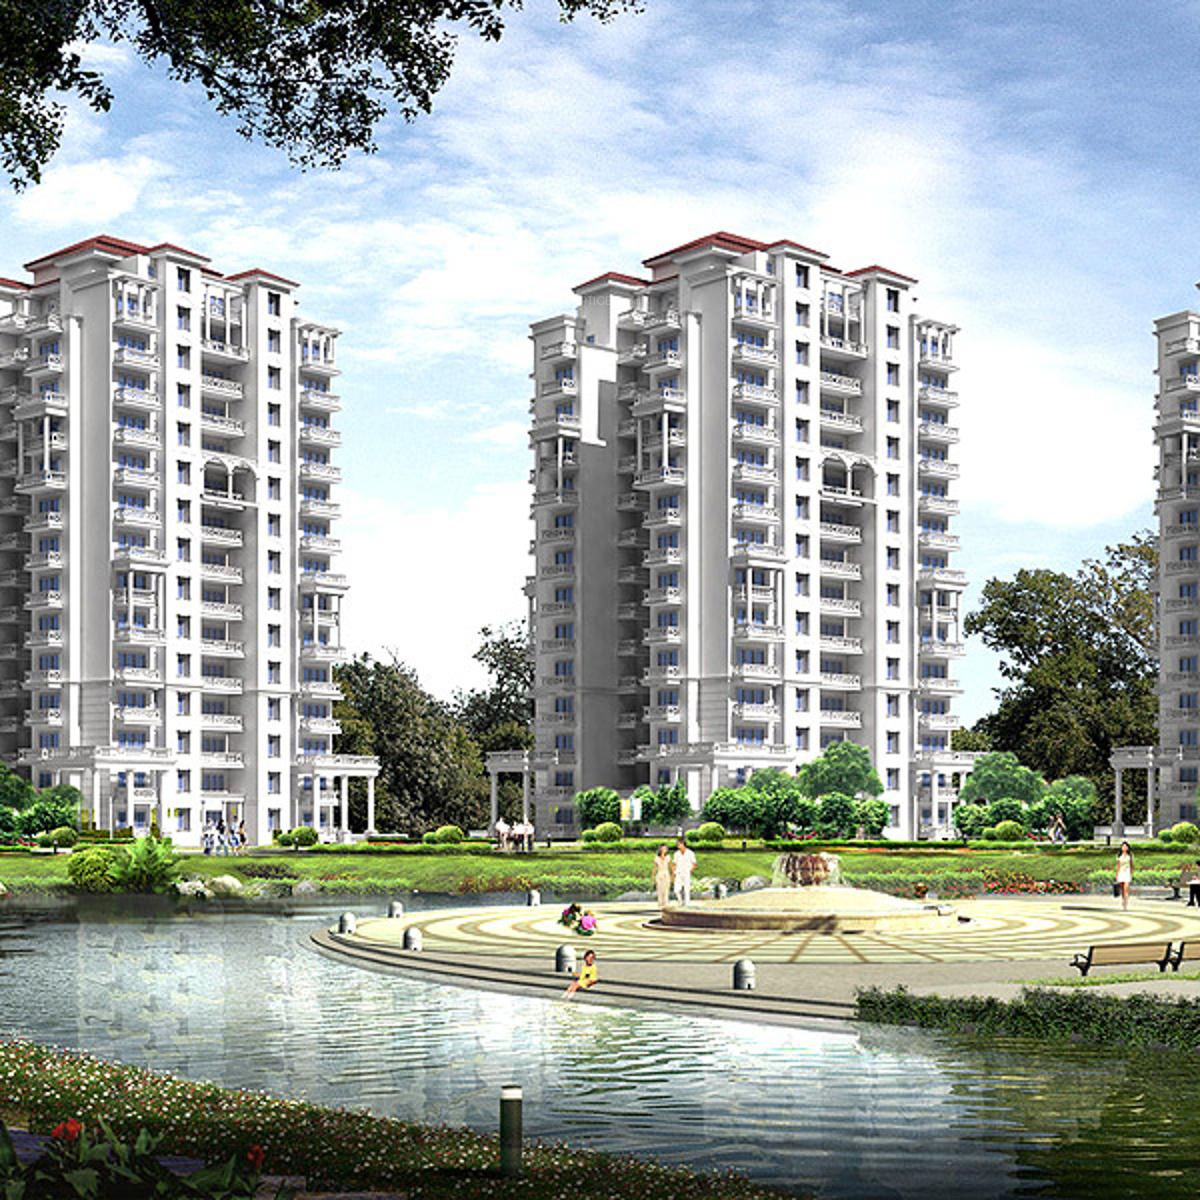 Tivoli Apartments: 1482 Sq Ft 2 BHK 2T Apartment For Sale In Tivoli Group